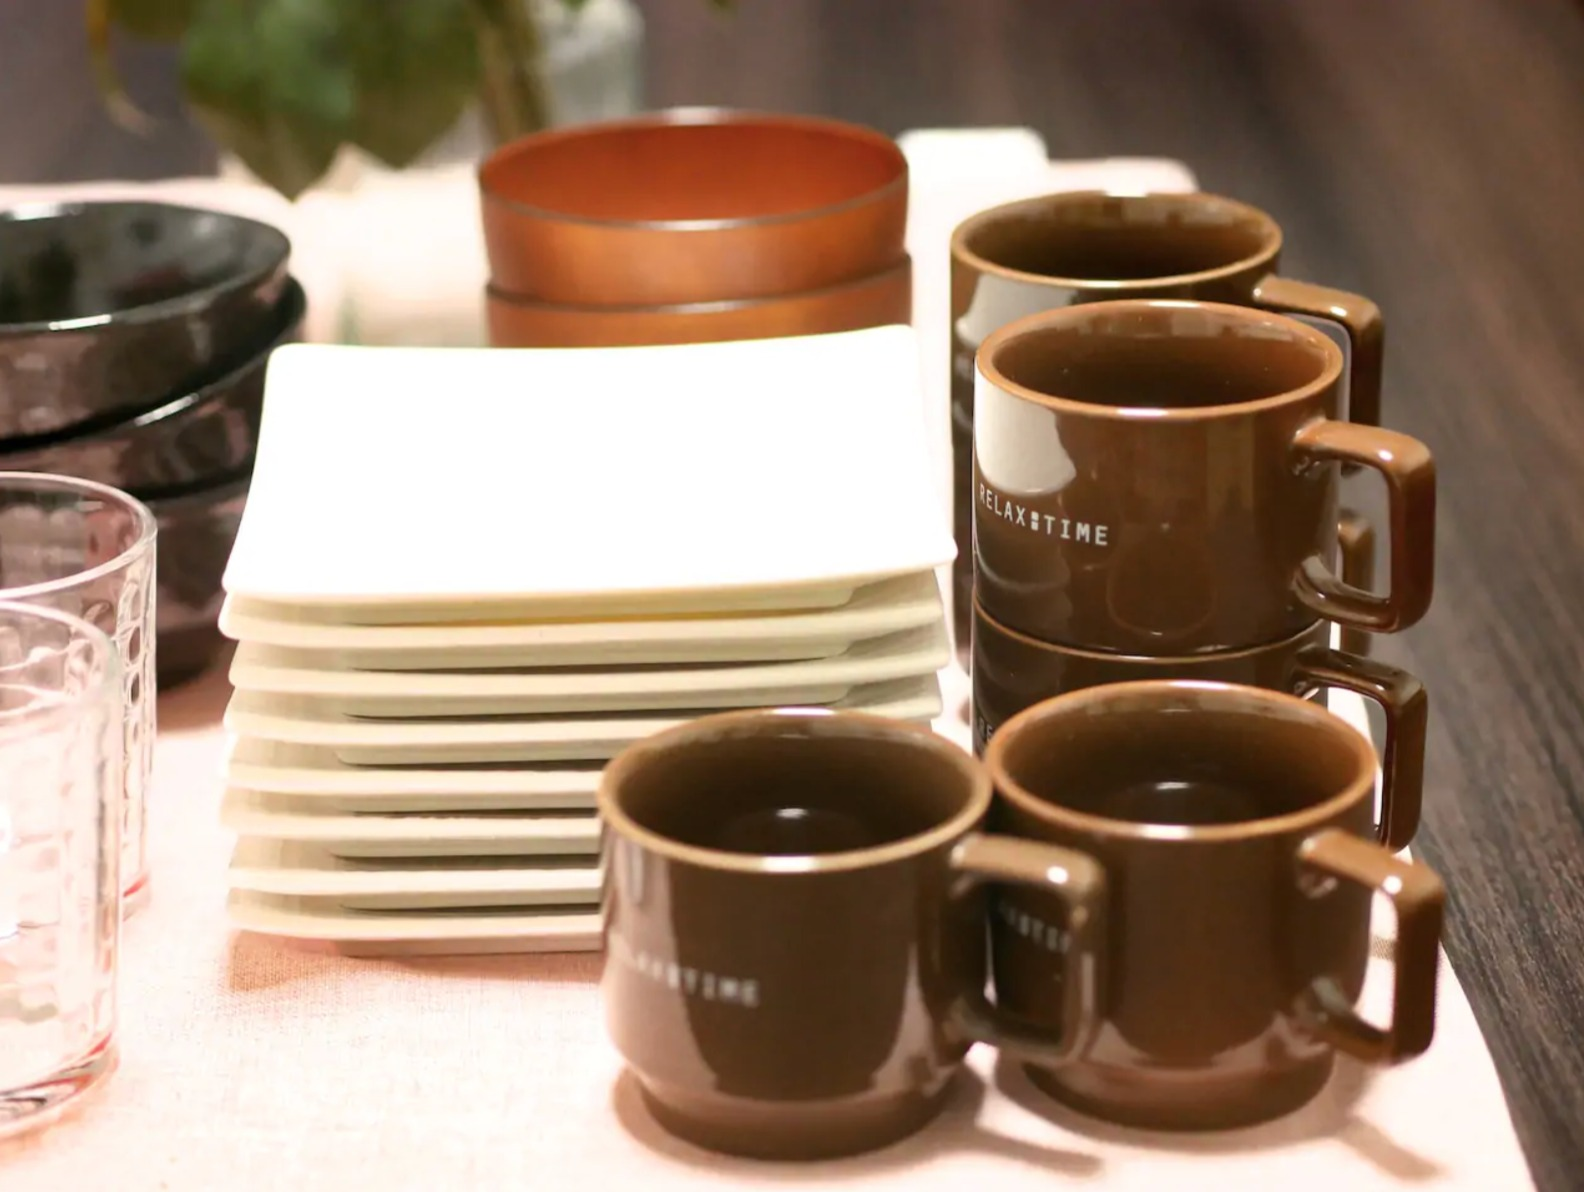 Dishes and cups are prepared! お皿やコップ類はご用意していますので、ご自由にご利用ください♪